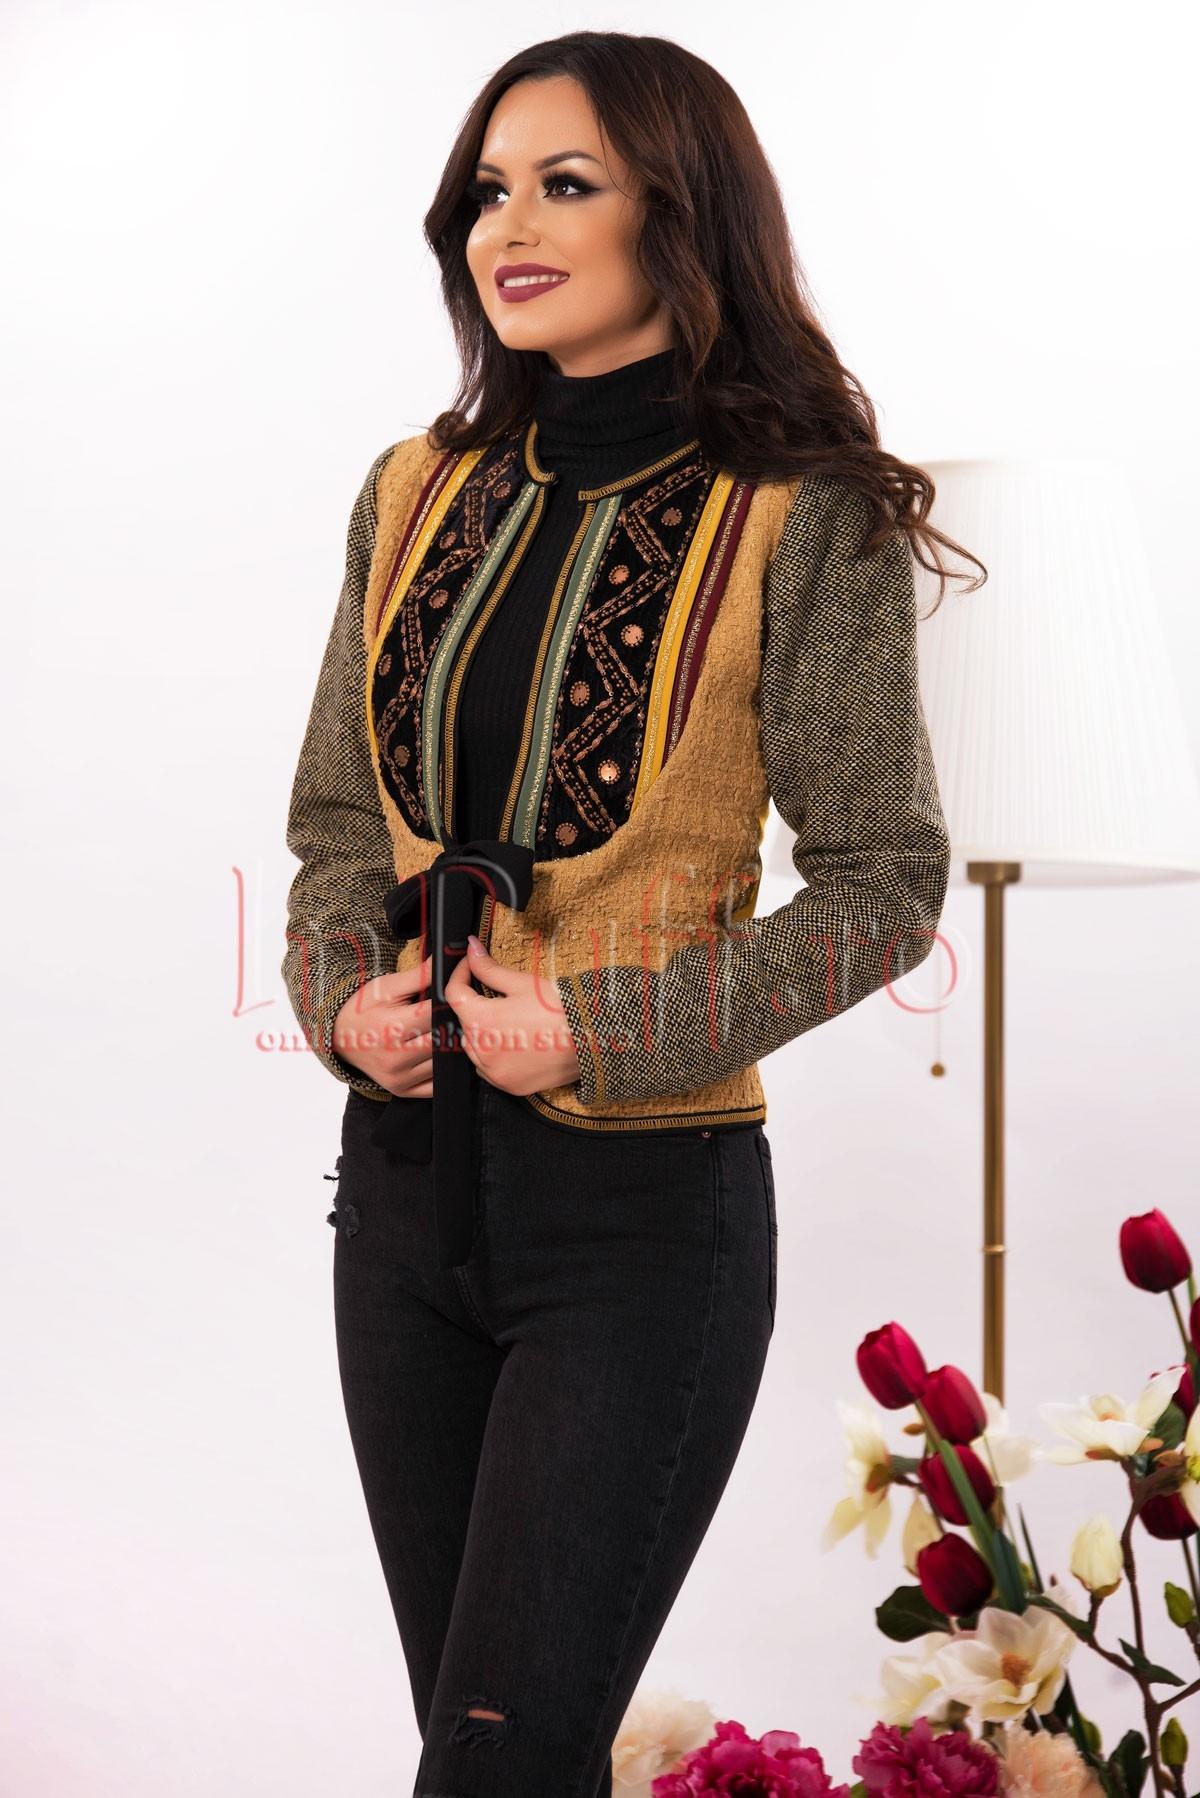 Jacheta traditionala galben mustar din lana